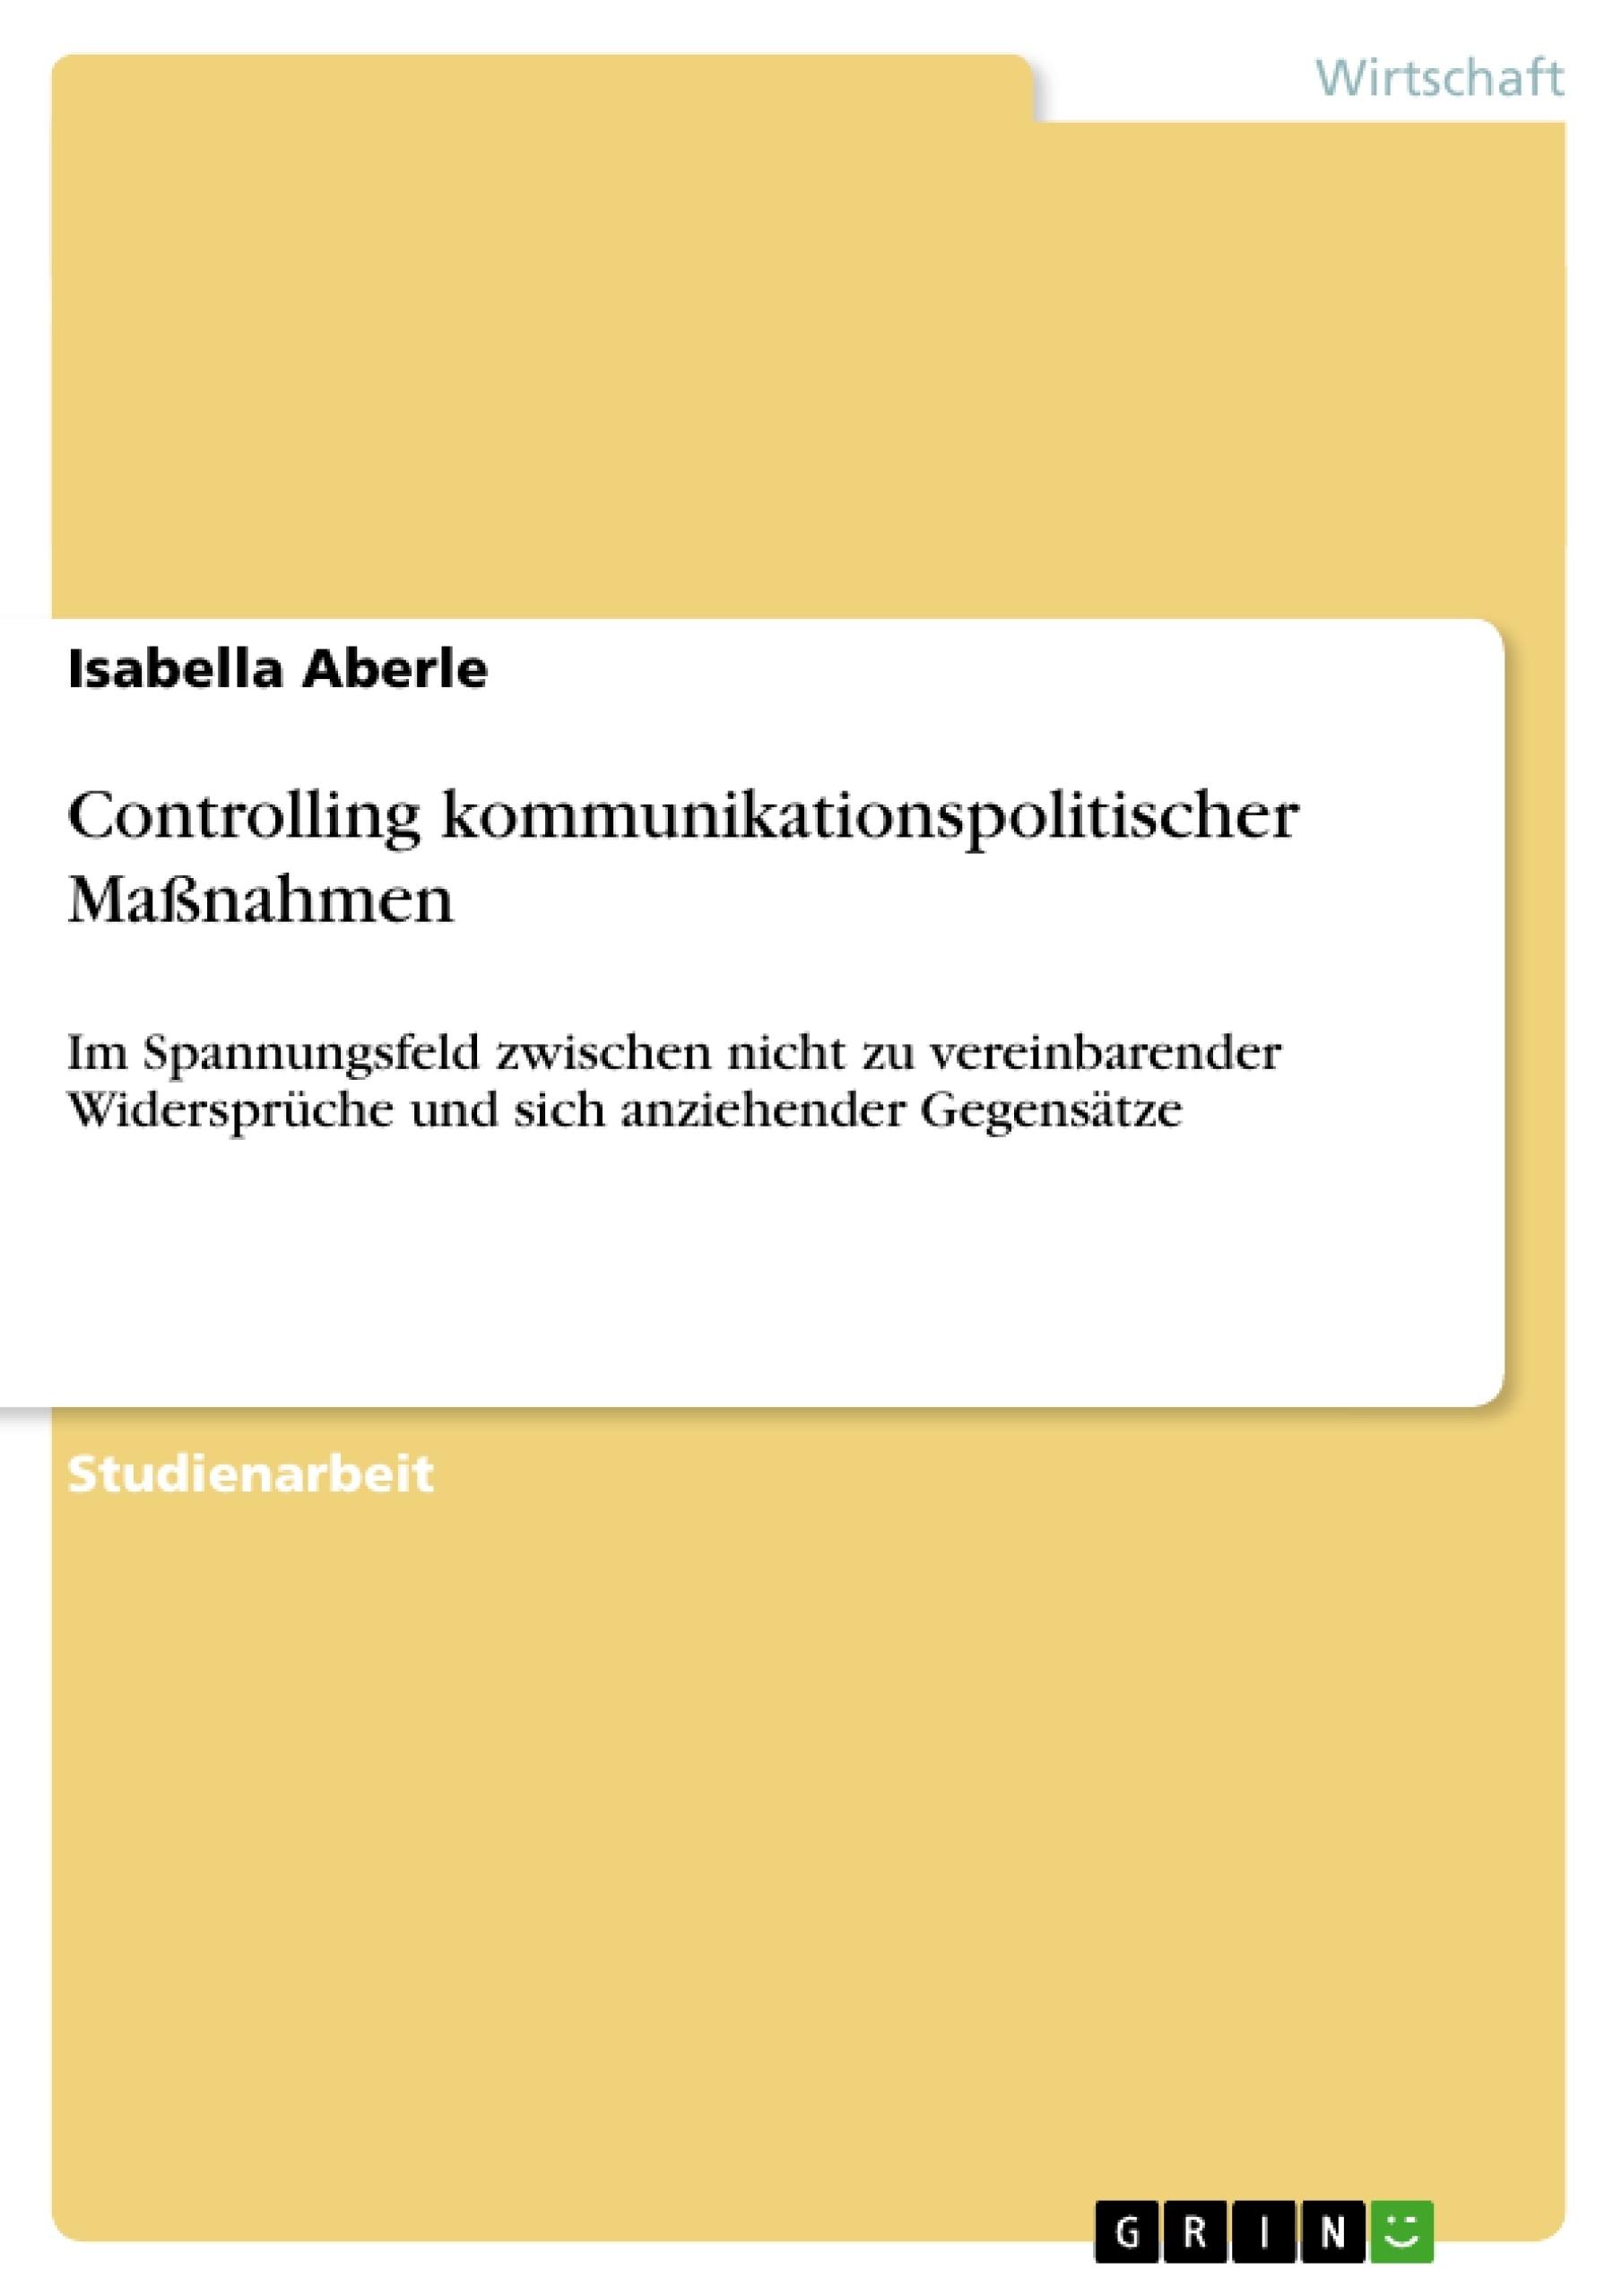 Titel: Controlling kommunikationspolitischer Maßnahmen